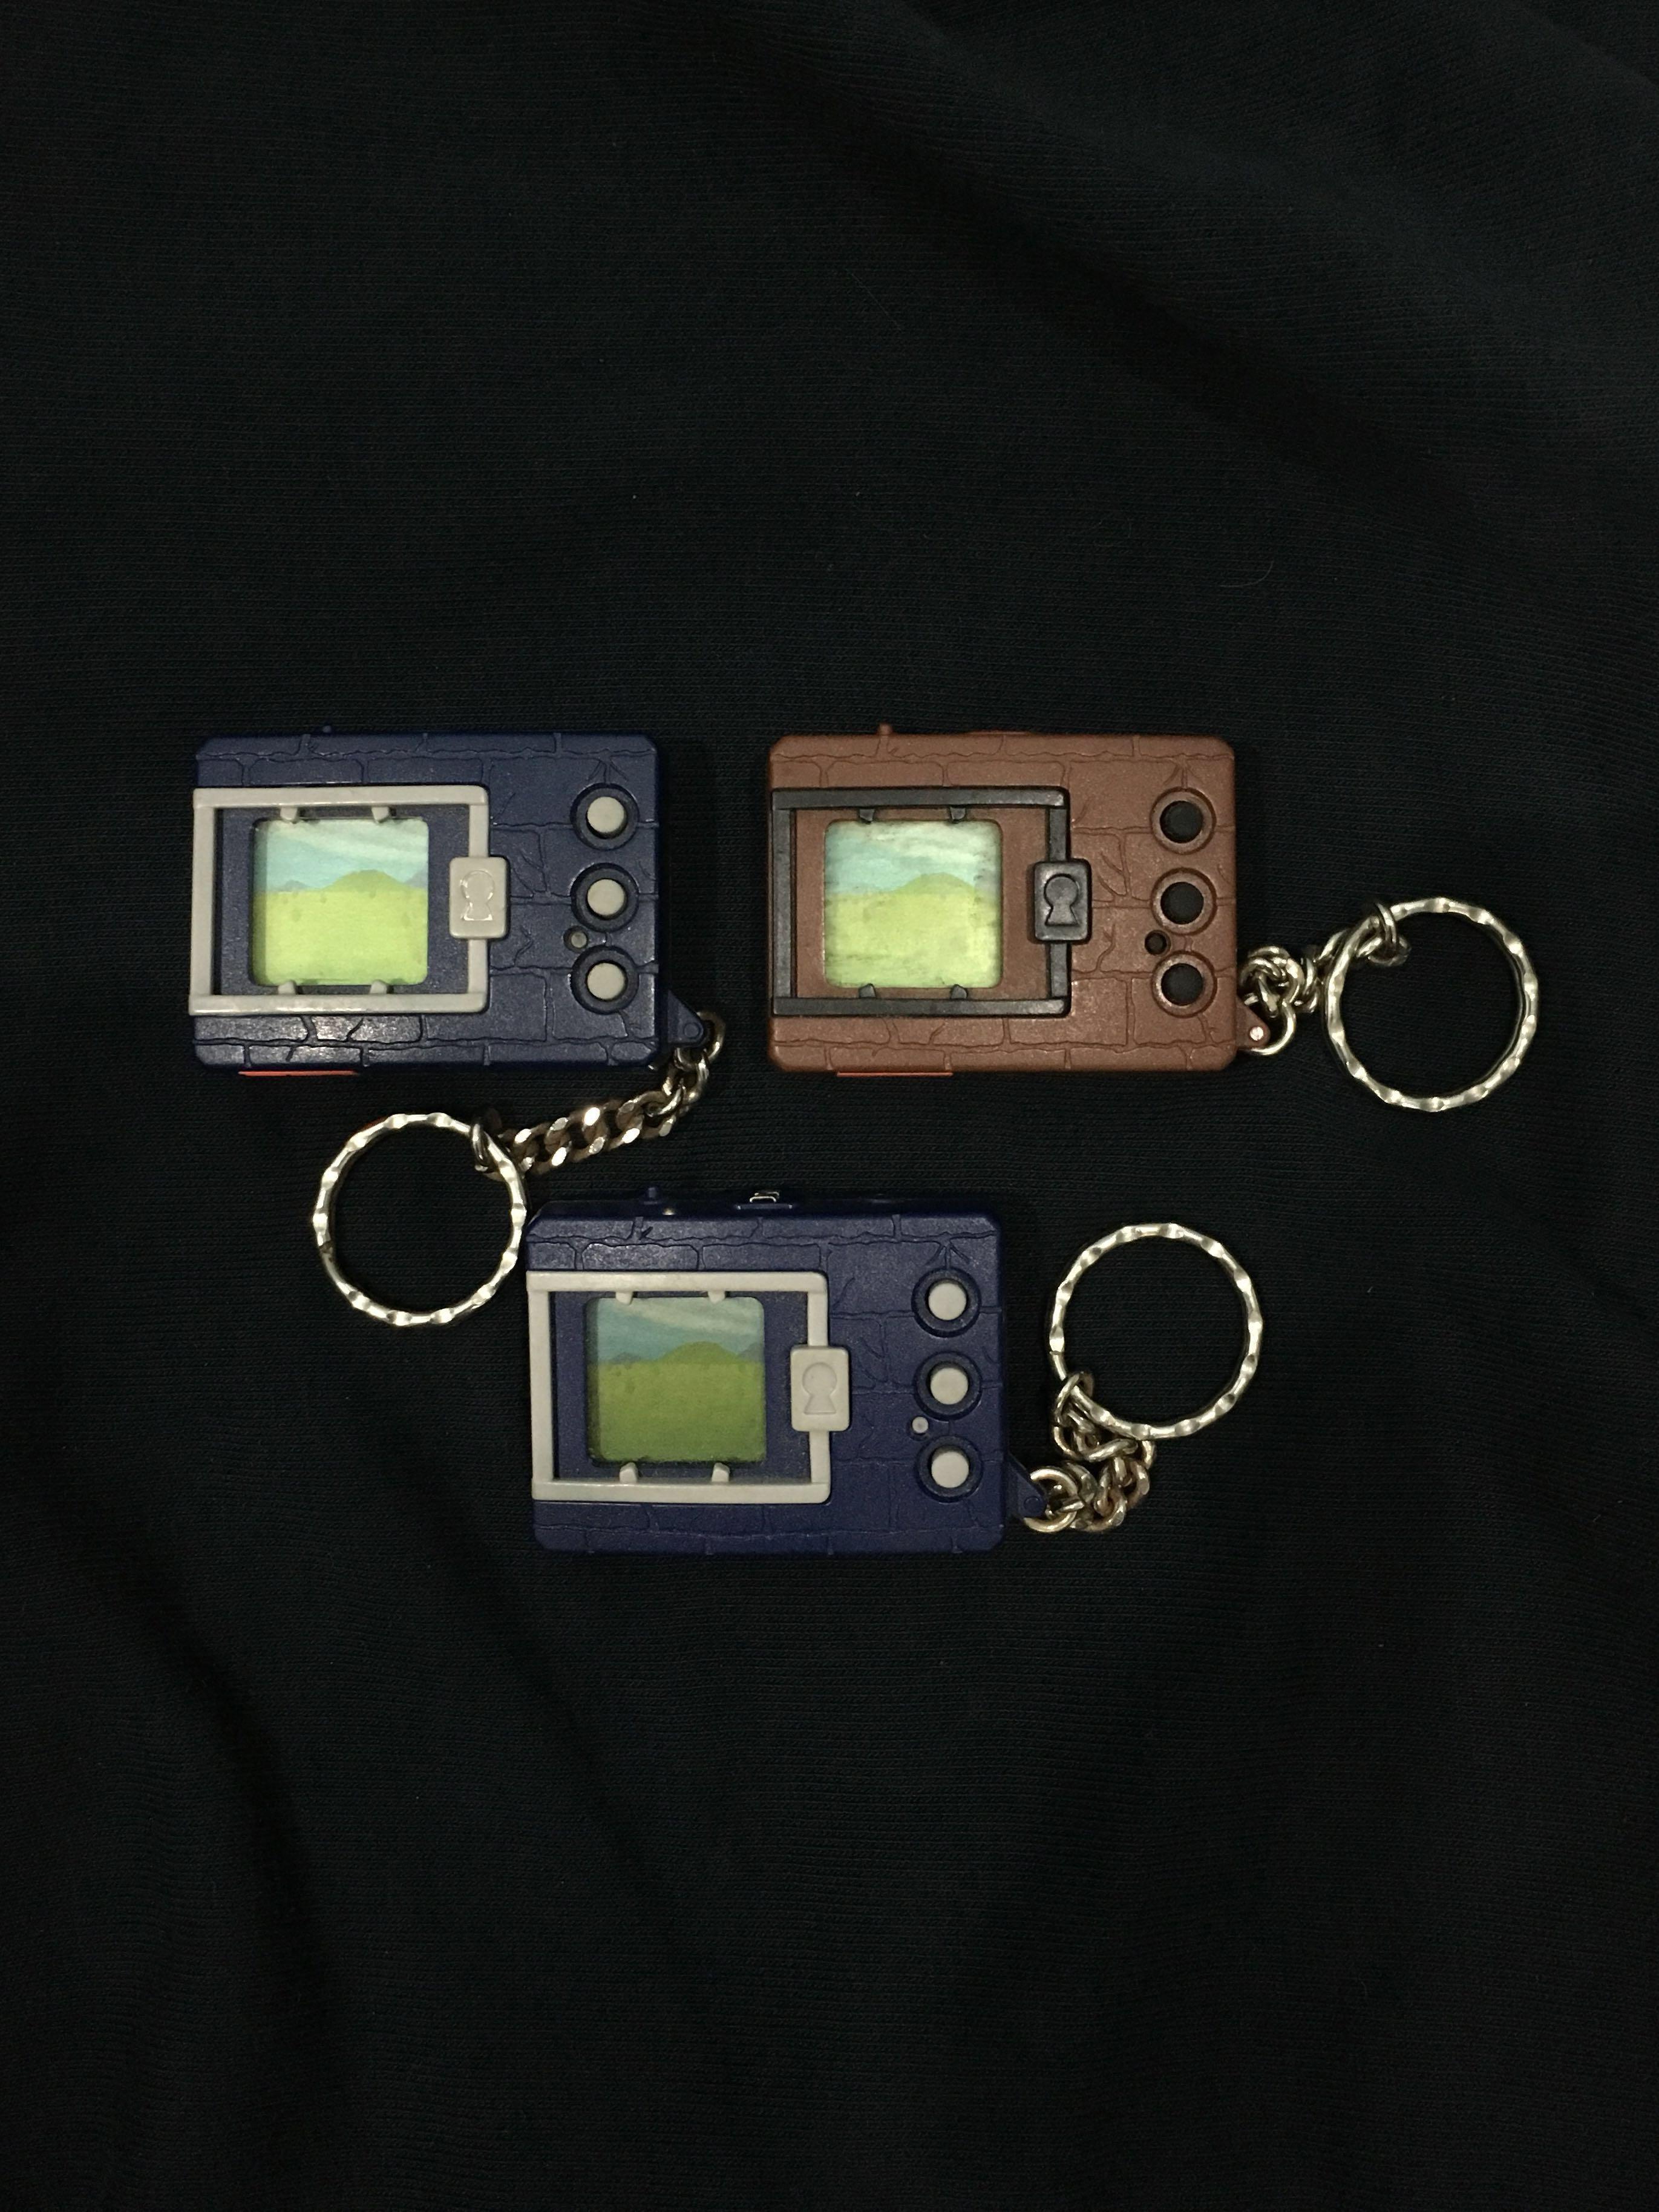 Digimon vpet 1997